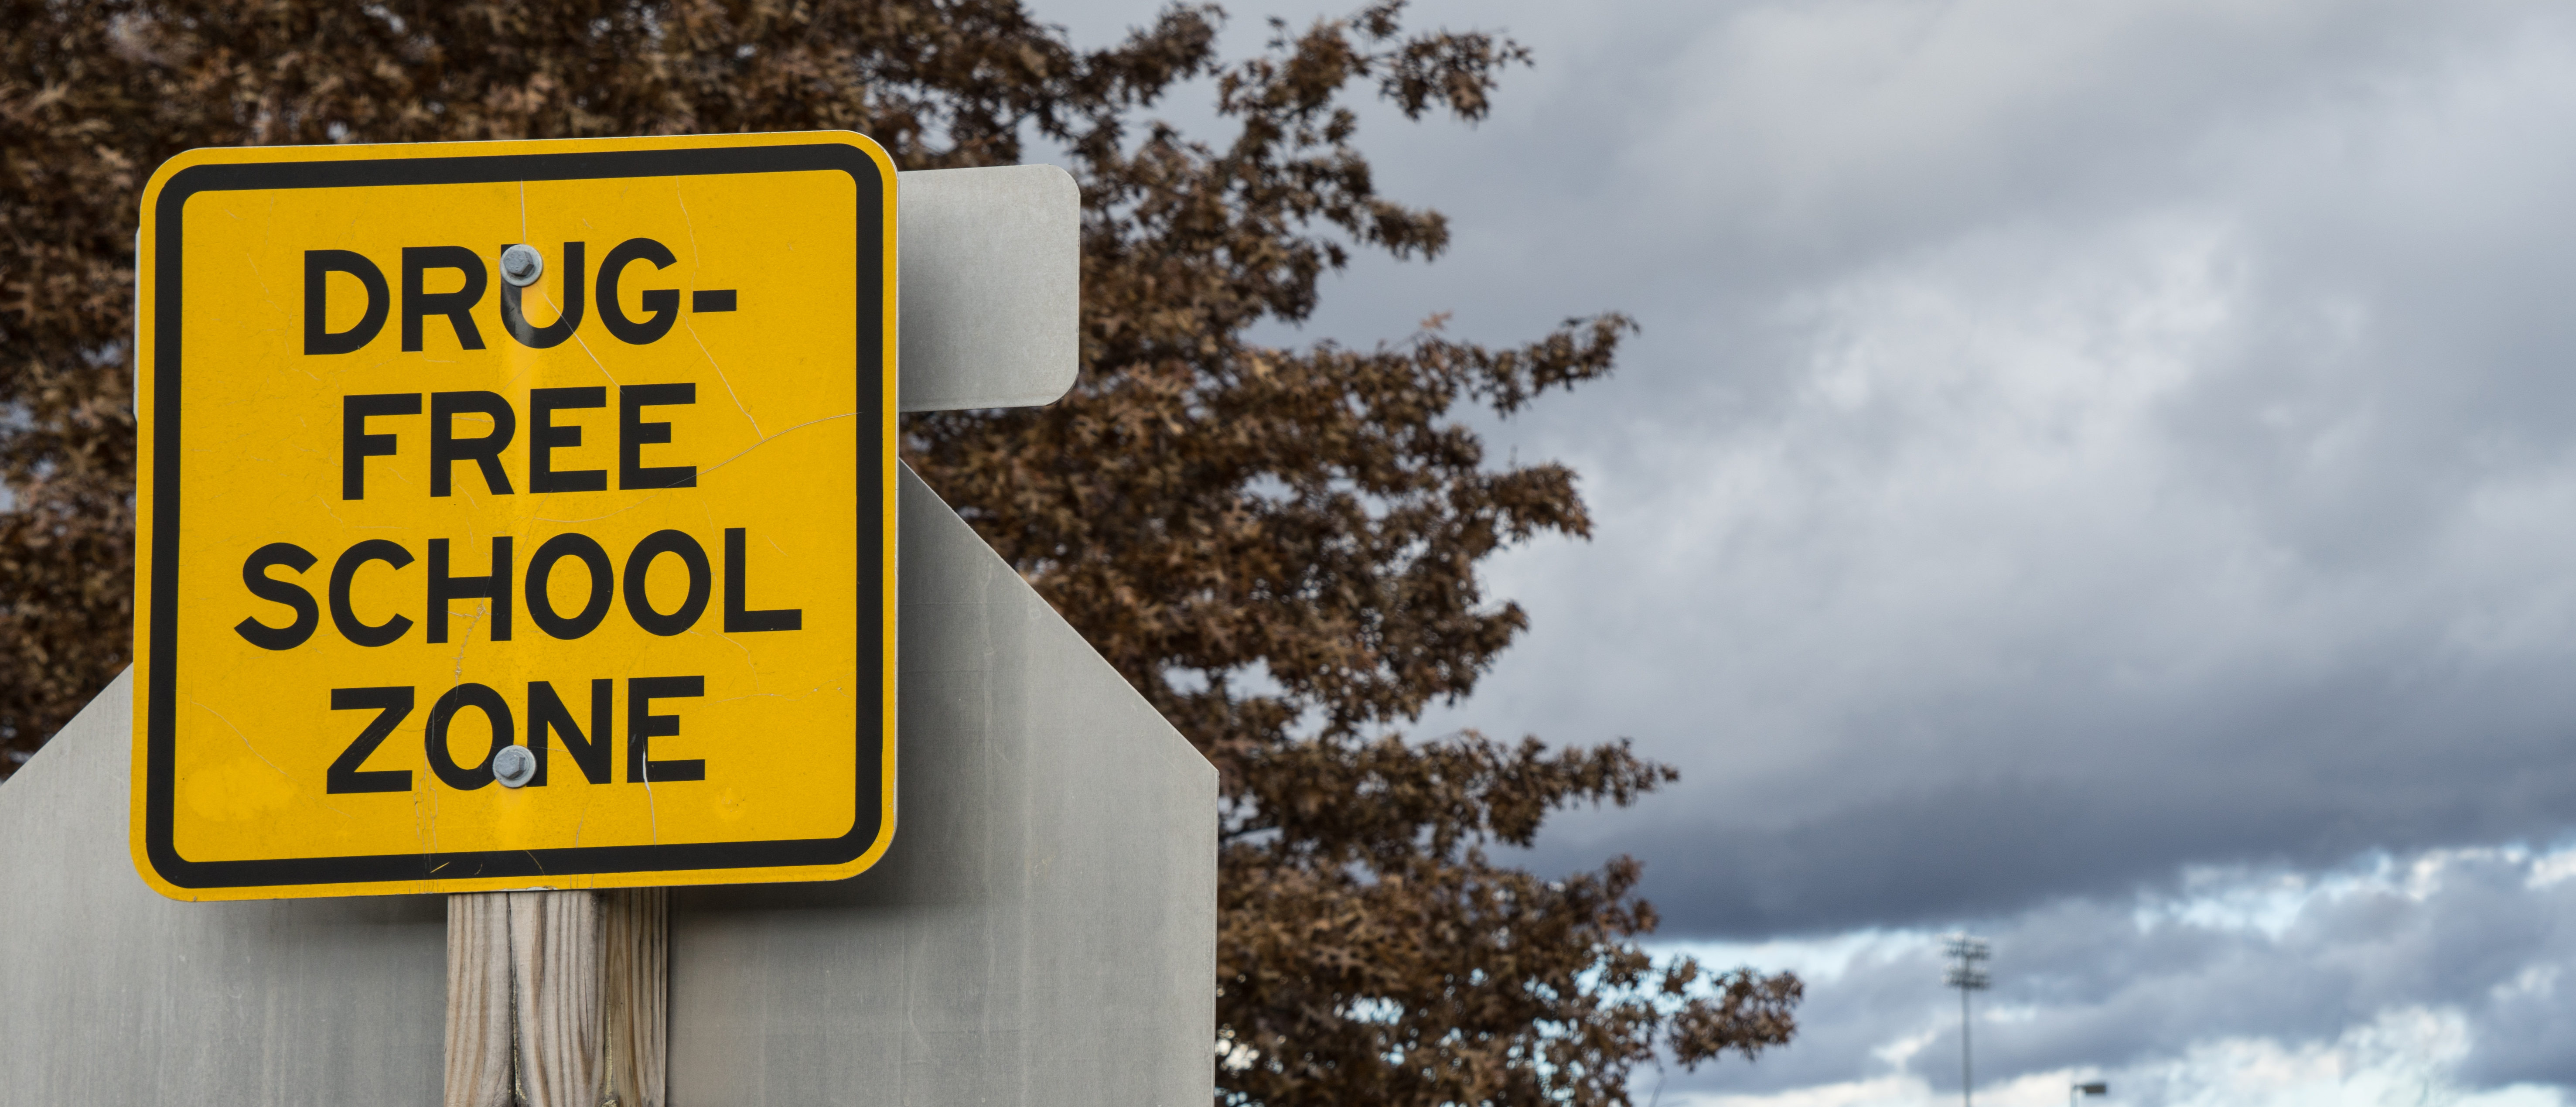 Drug free school sign (Shutterstock/Timur Laykov)